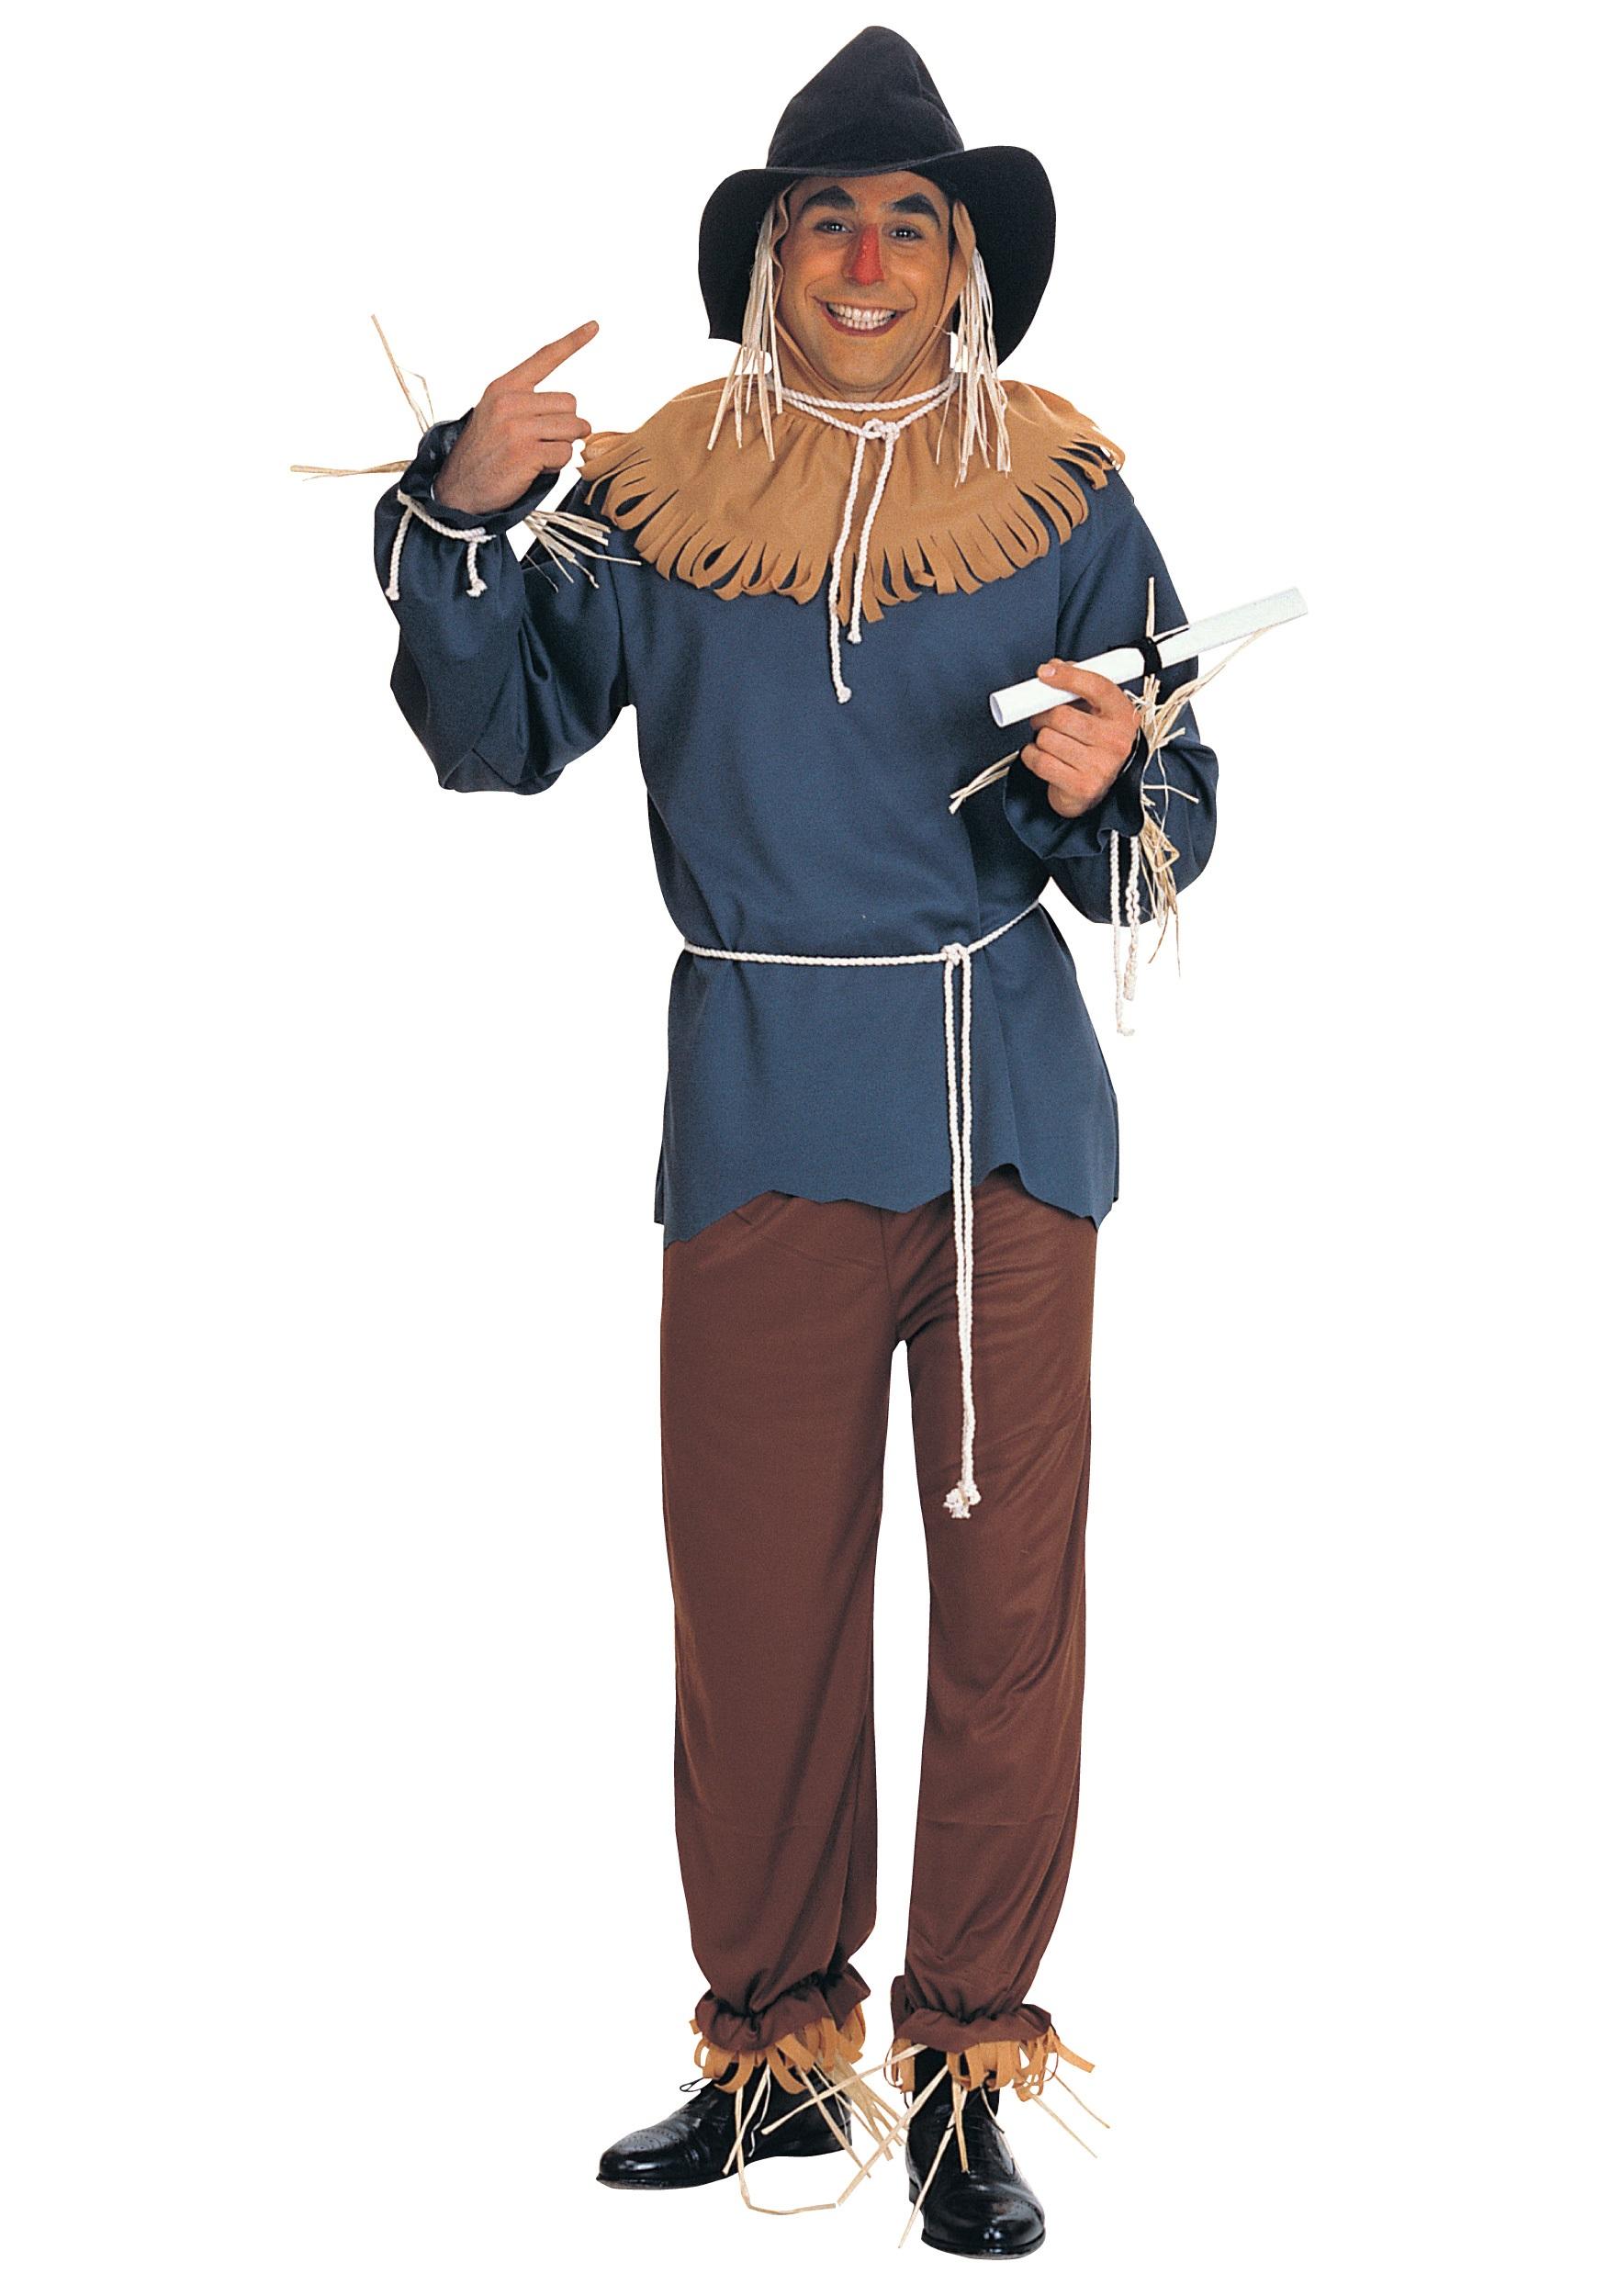 Wizard of Oz Costumes - Rental Costume